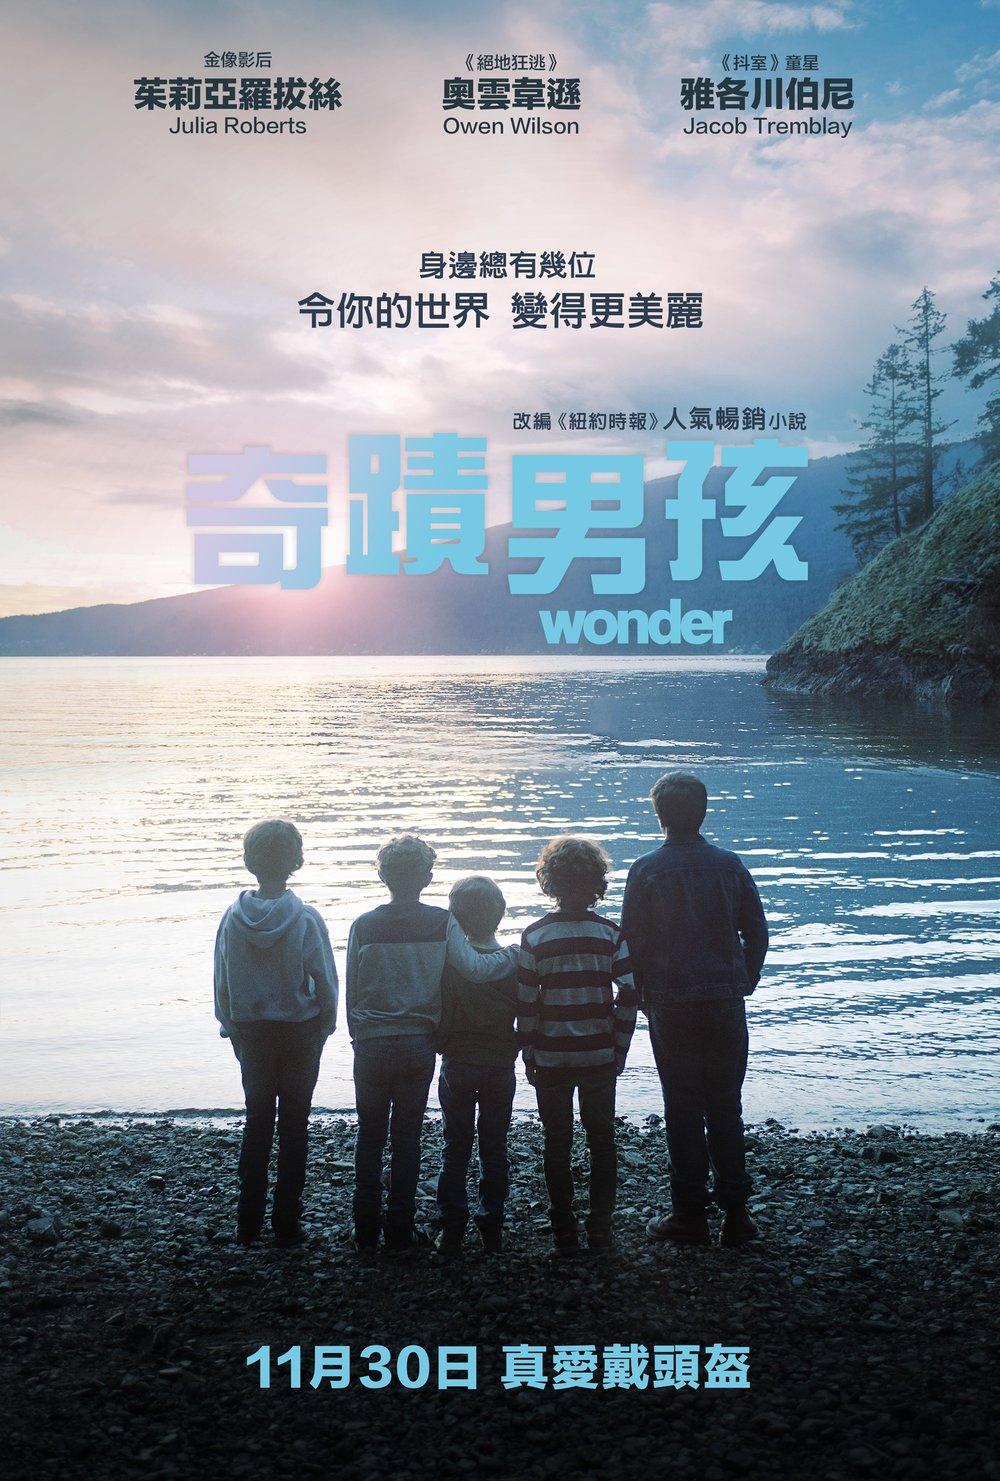 20170919_Wonder_Poster.jpg